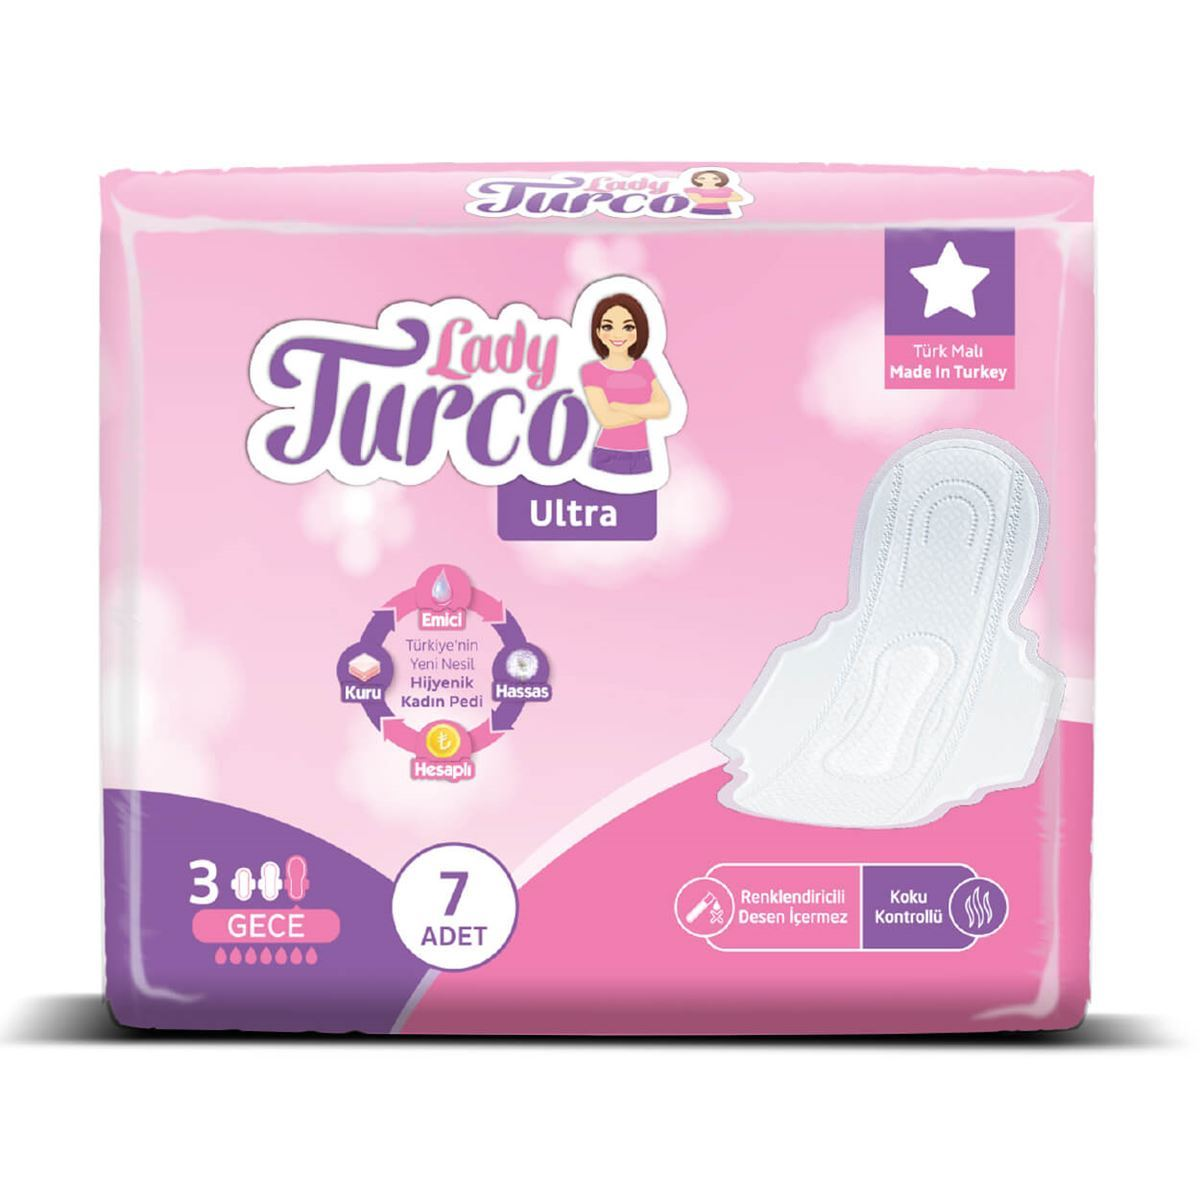 Lady Turco Ultra Gece 7 Ped